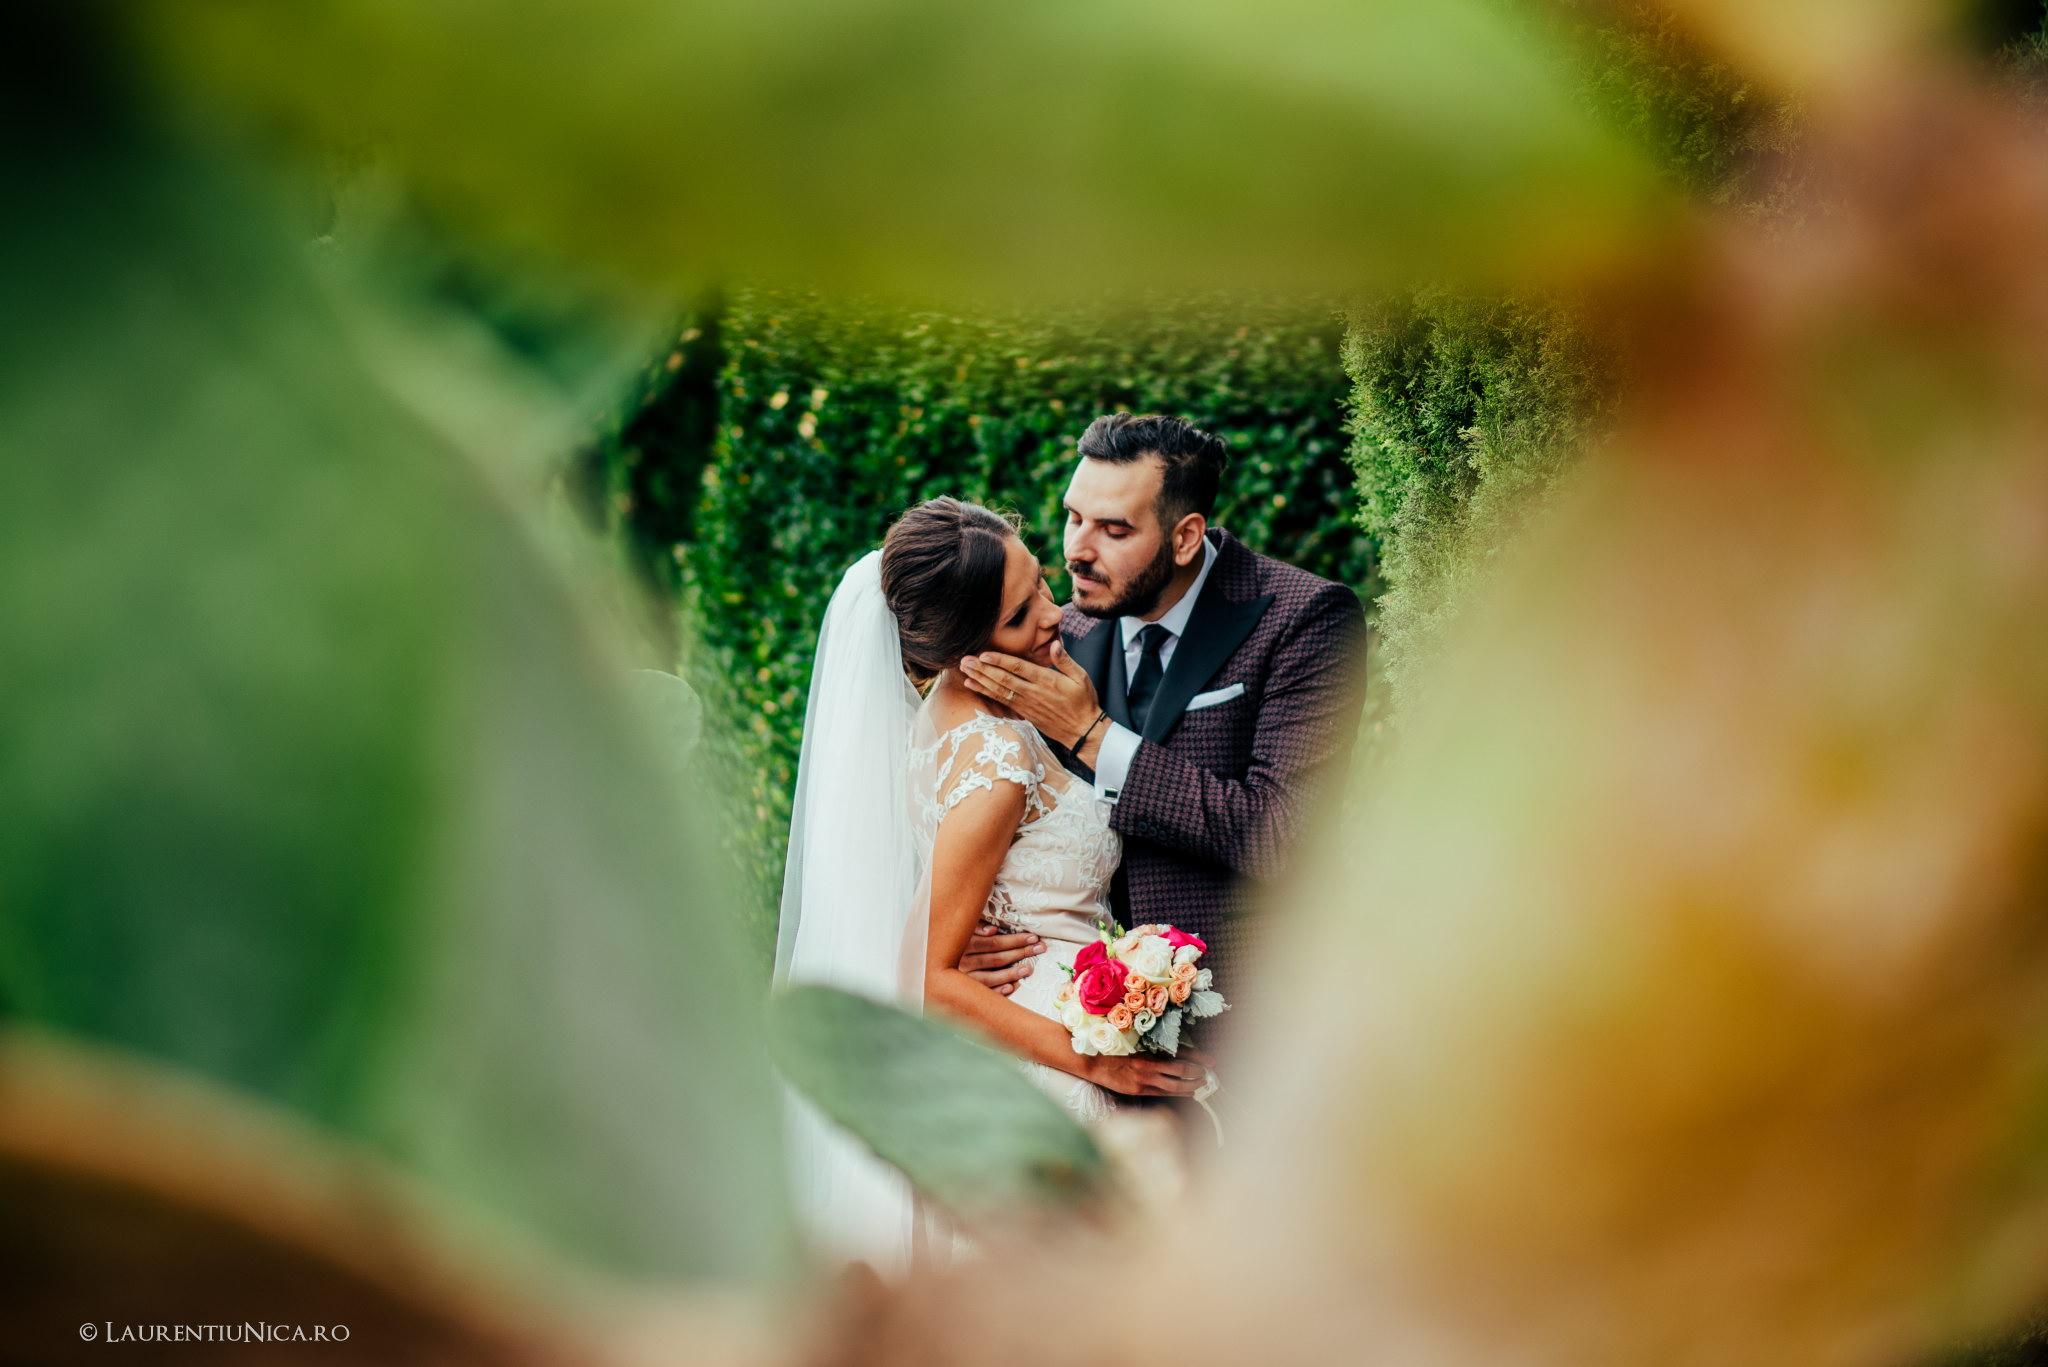 andreea si alin fotografii after wedding balchik bulgaria14 - Andreea & Alin | Fotografii After Wedding | Balchik Bulgaria